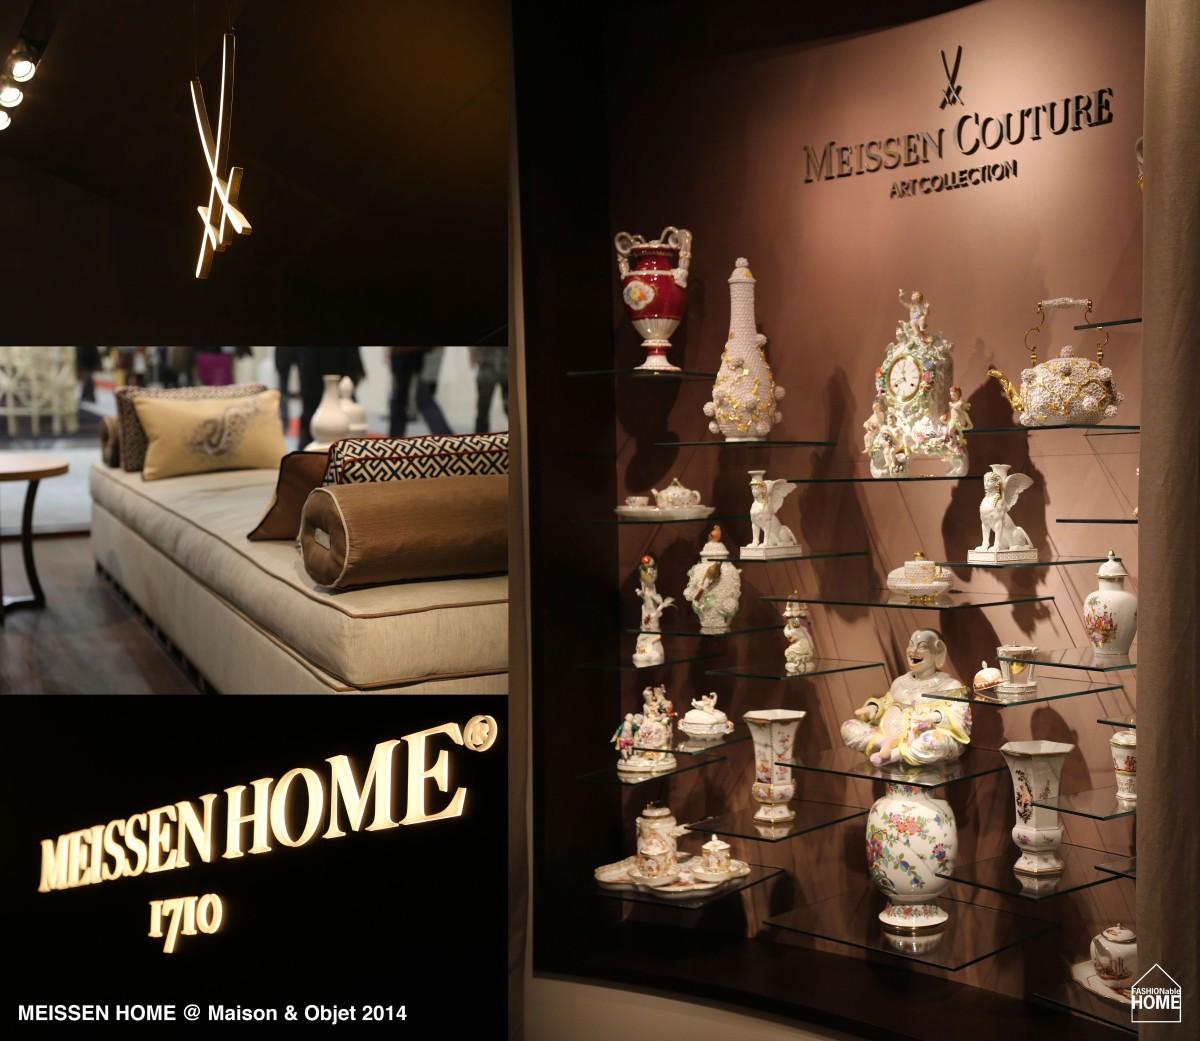 MEISSEN Home @ Maison & Objet 2014